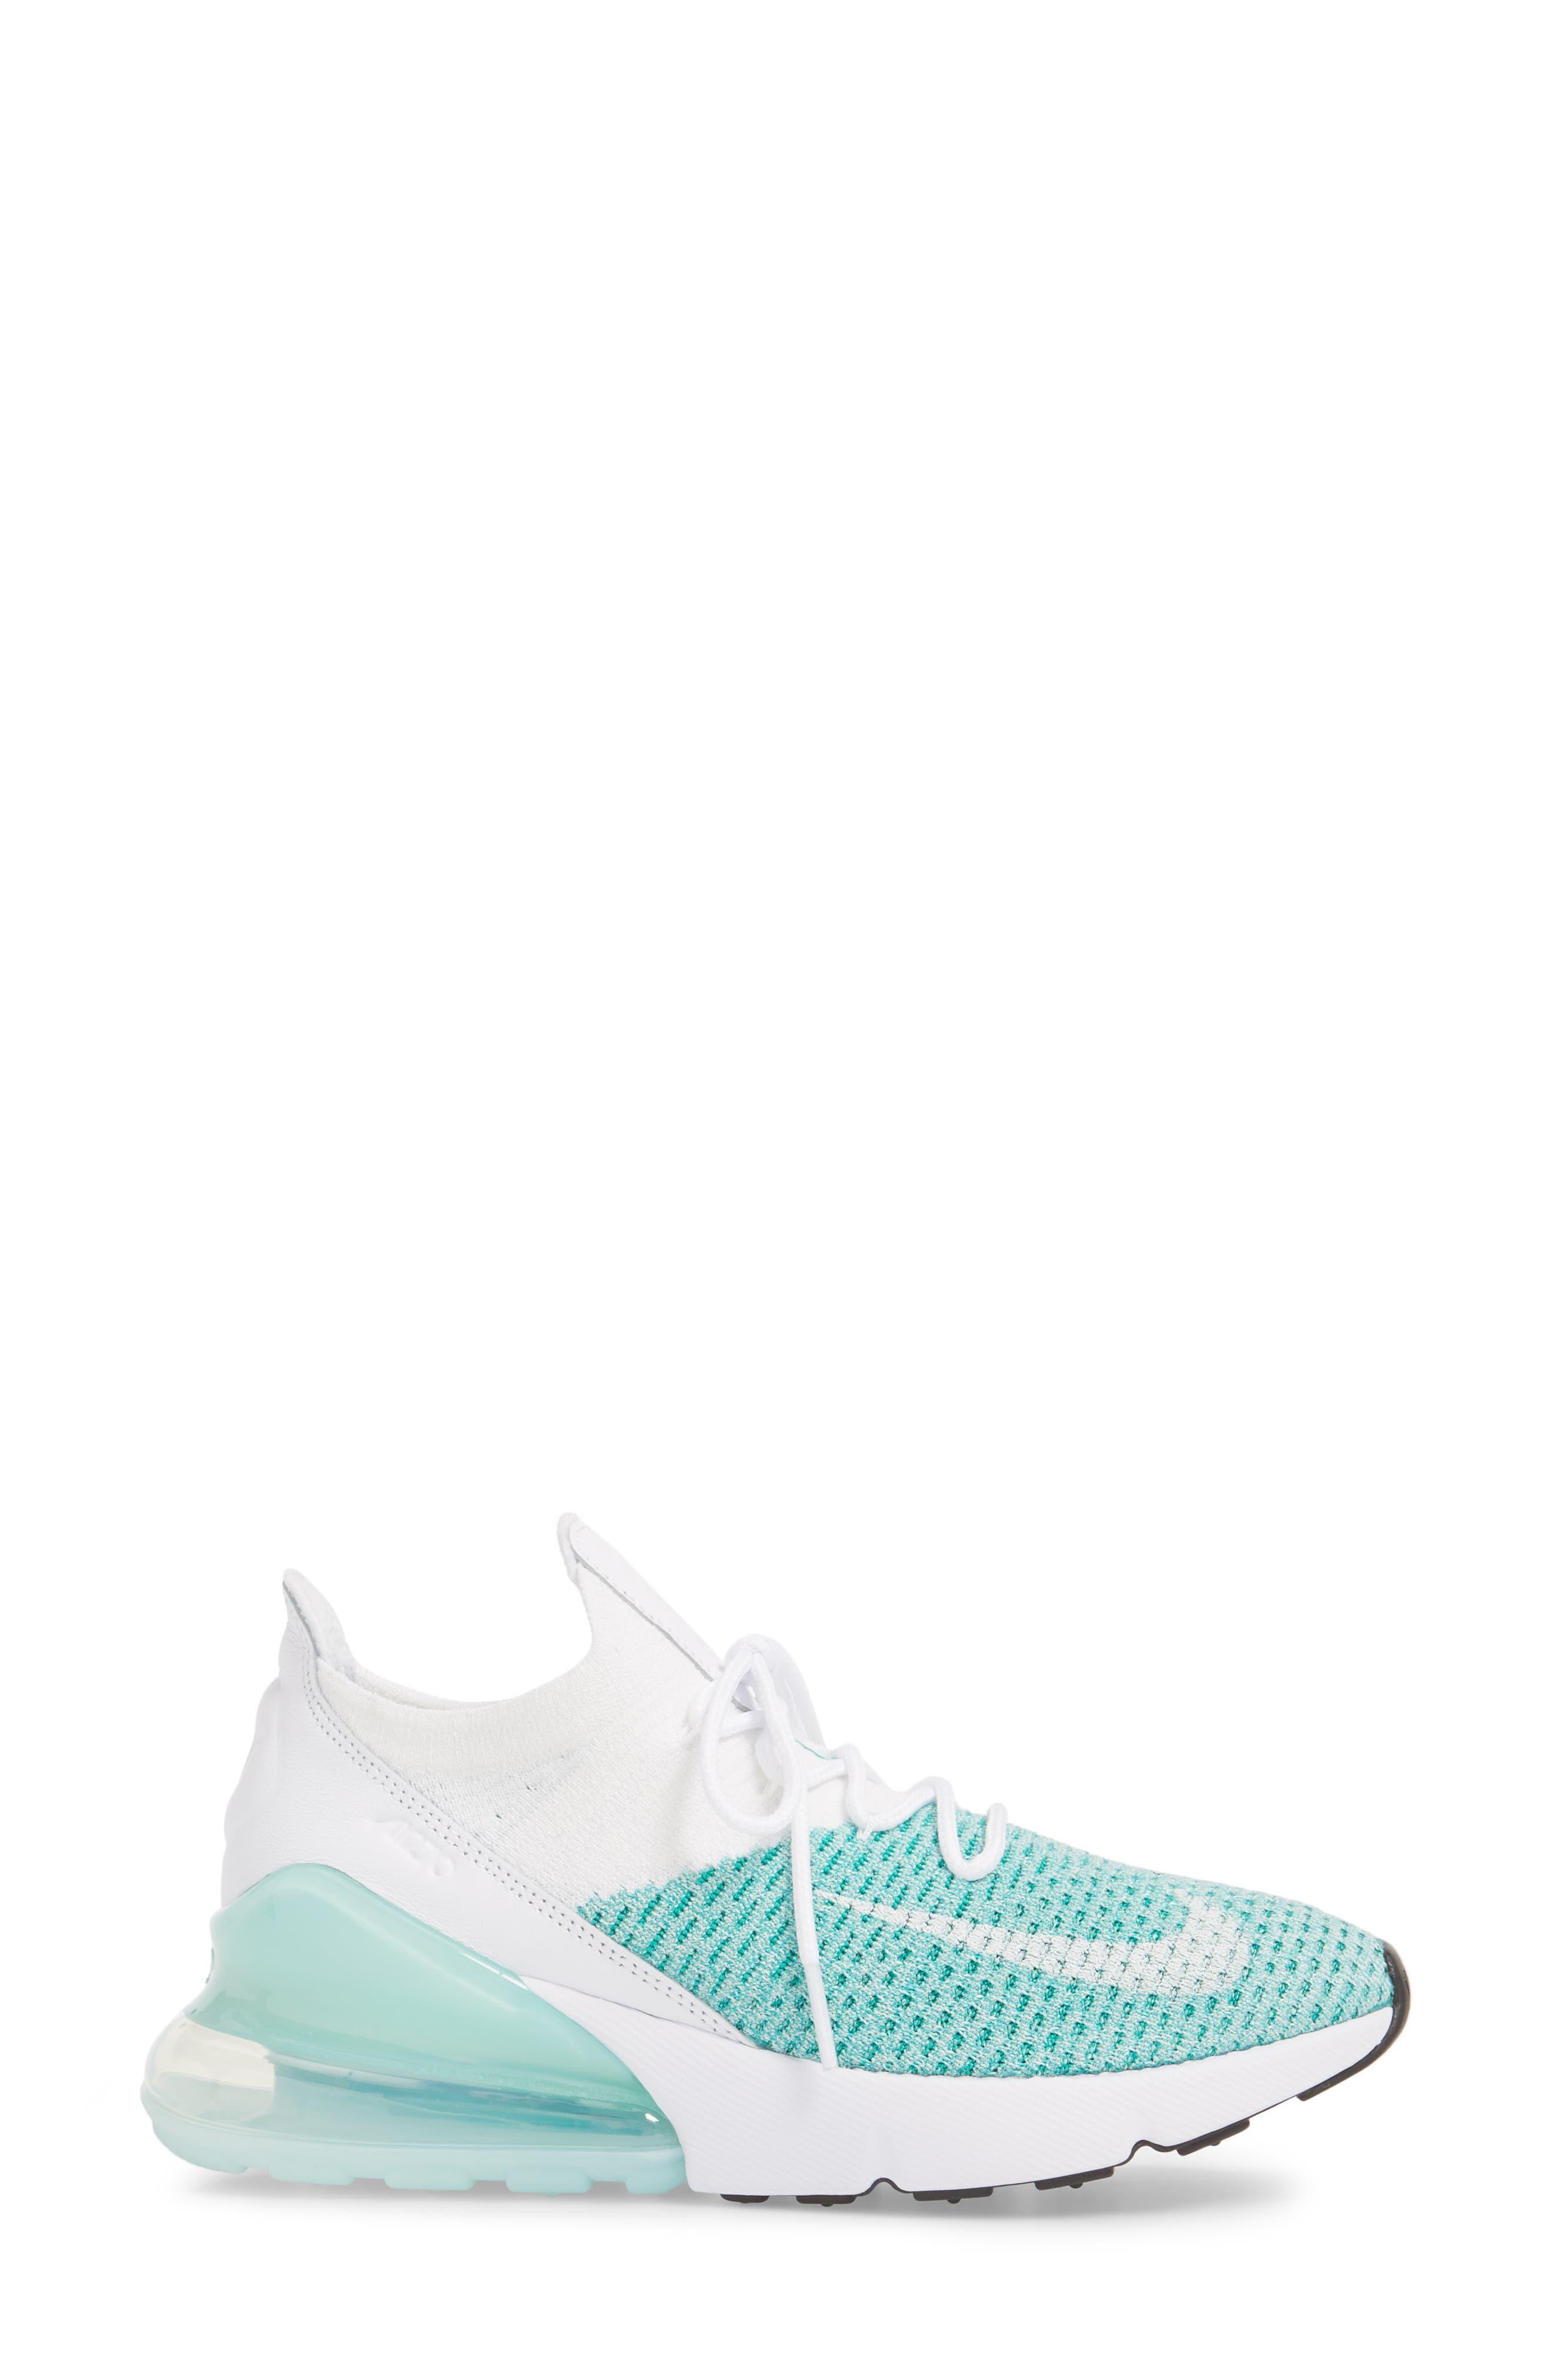 Air Max 270 Flyknit Sneaker,                             Alternate thumbnail 18, color,